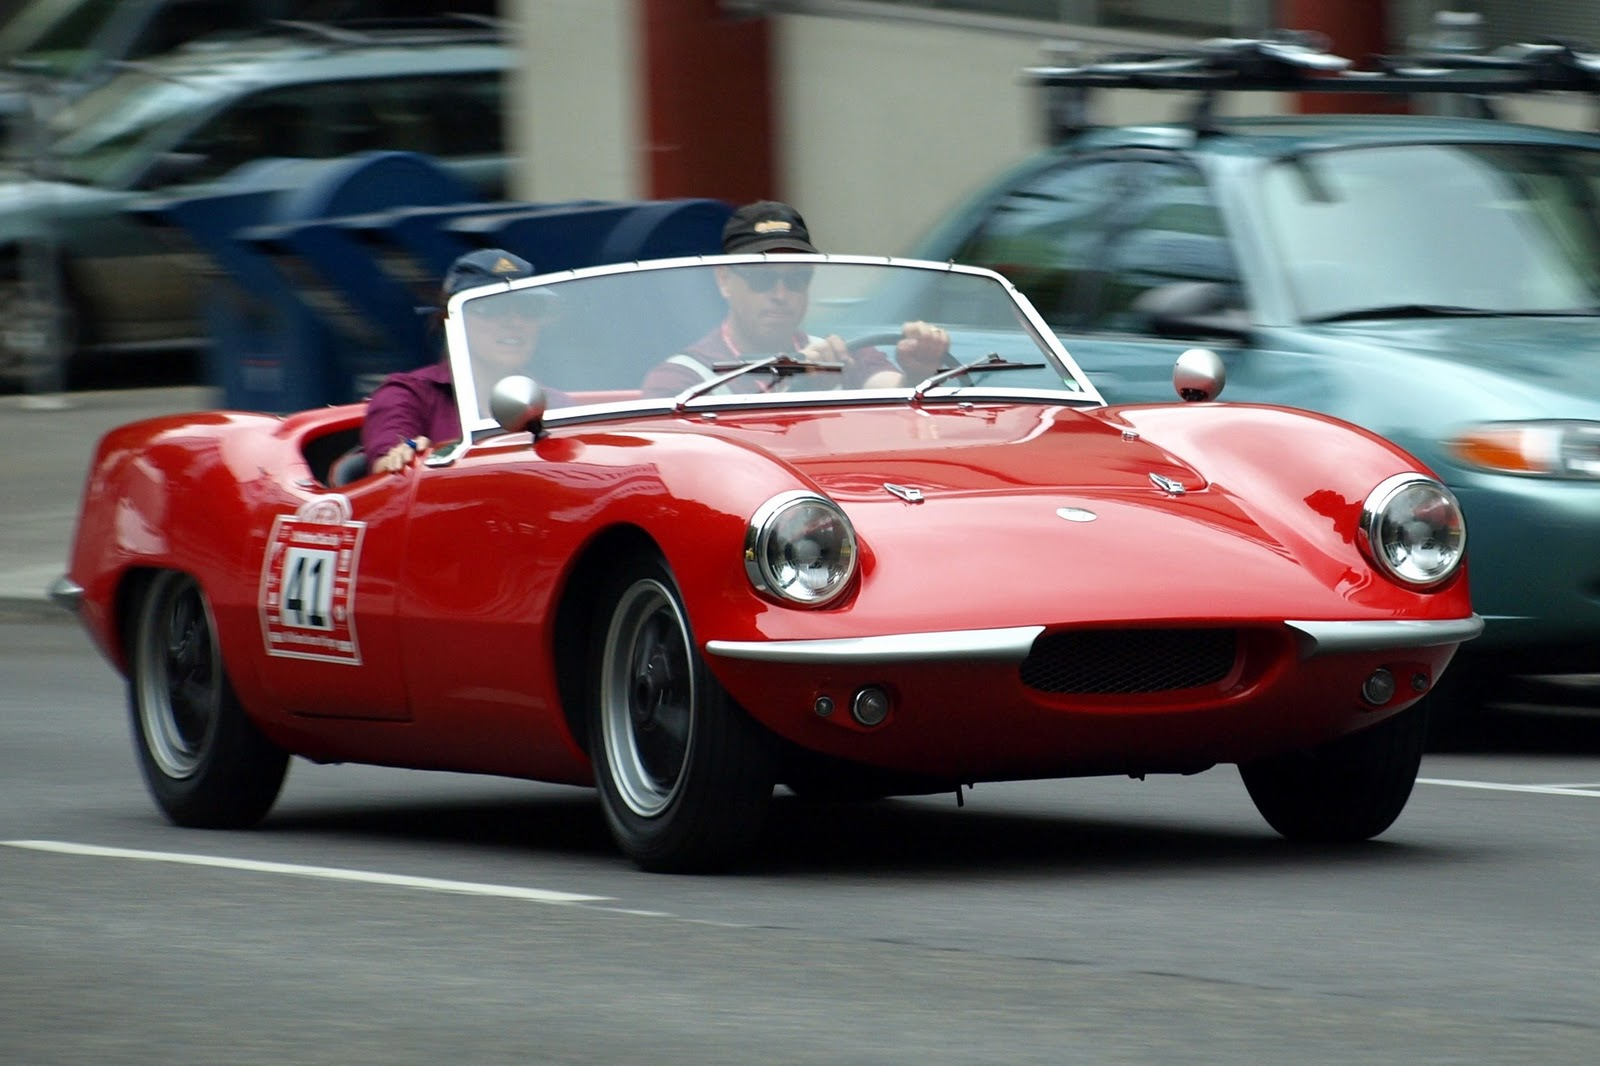 Reliable Sports Cars: Reliable Sports Cars